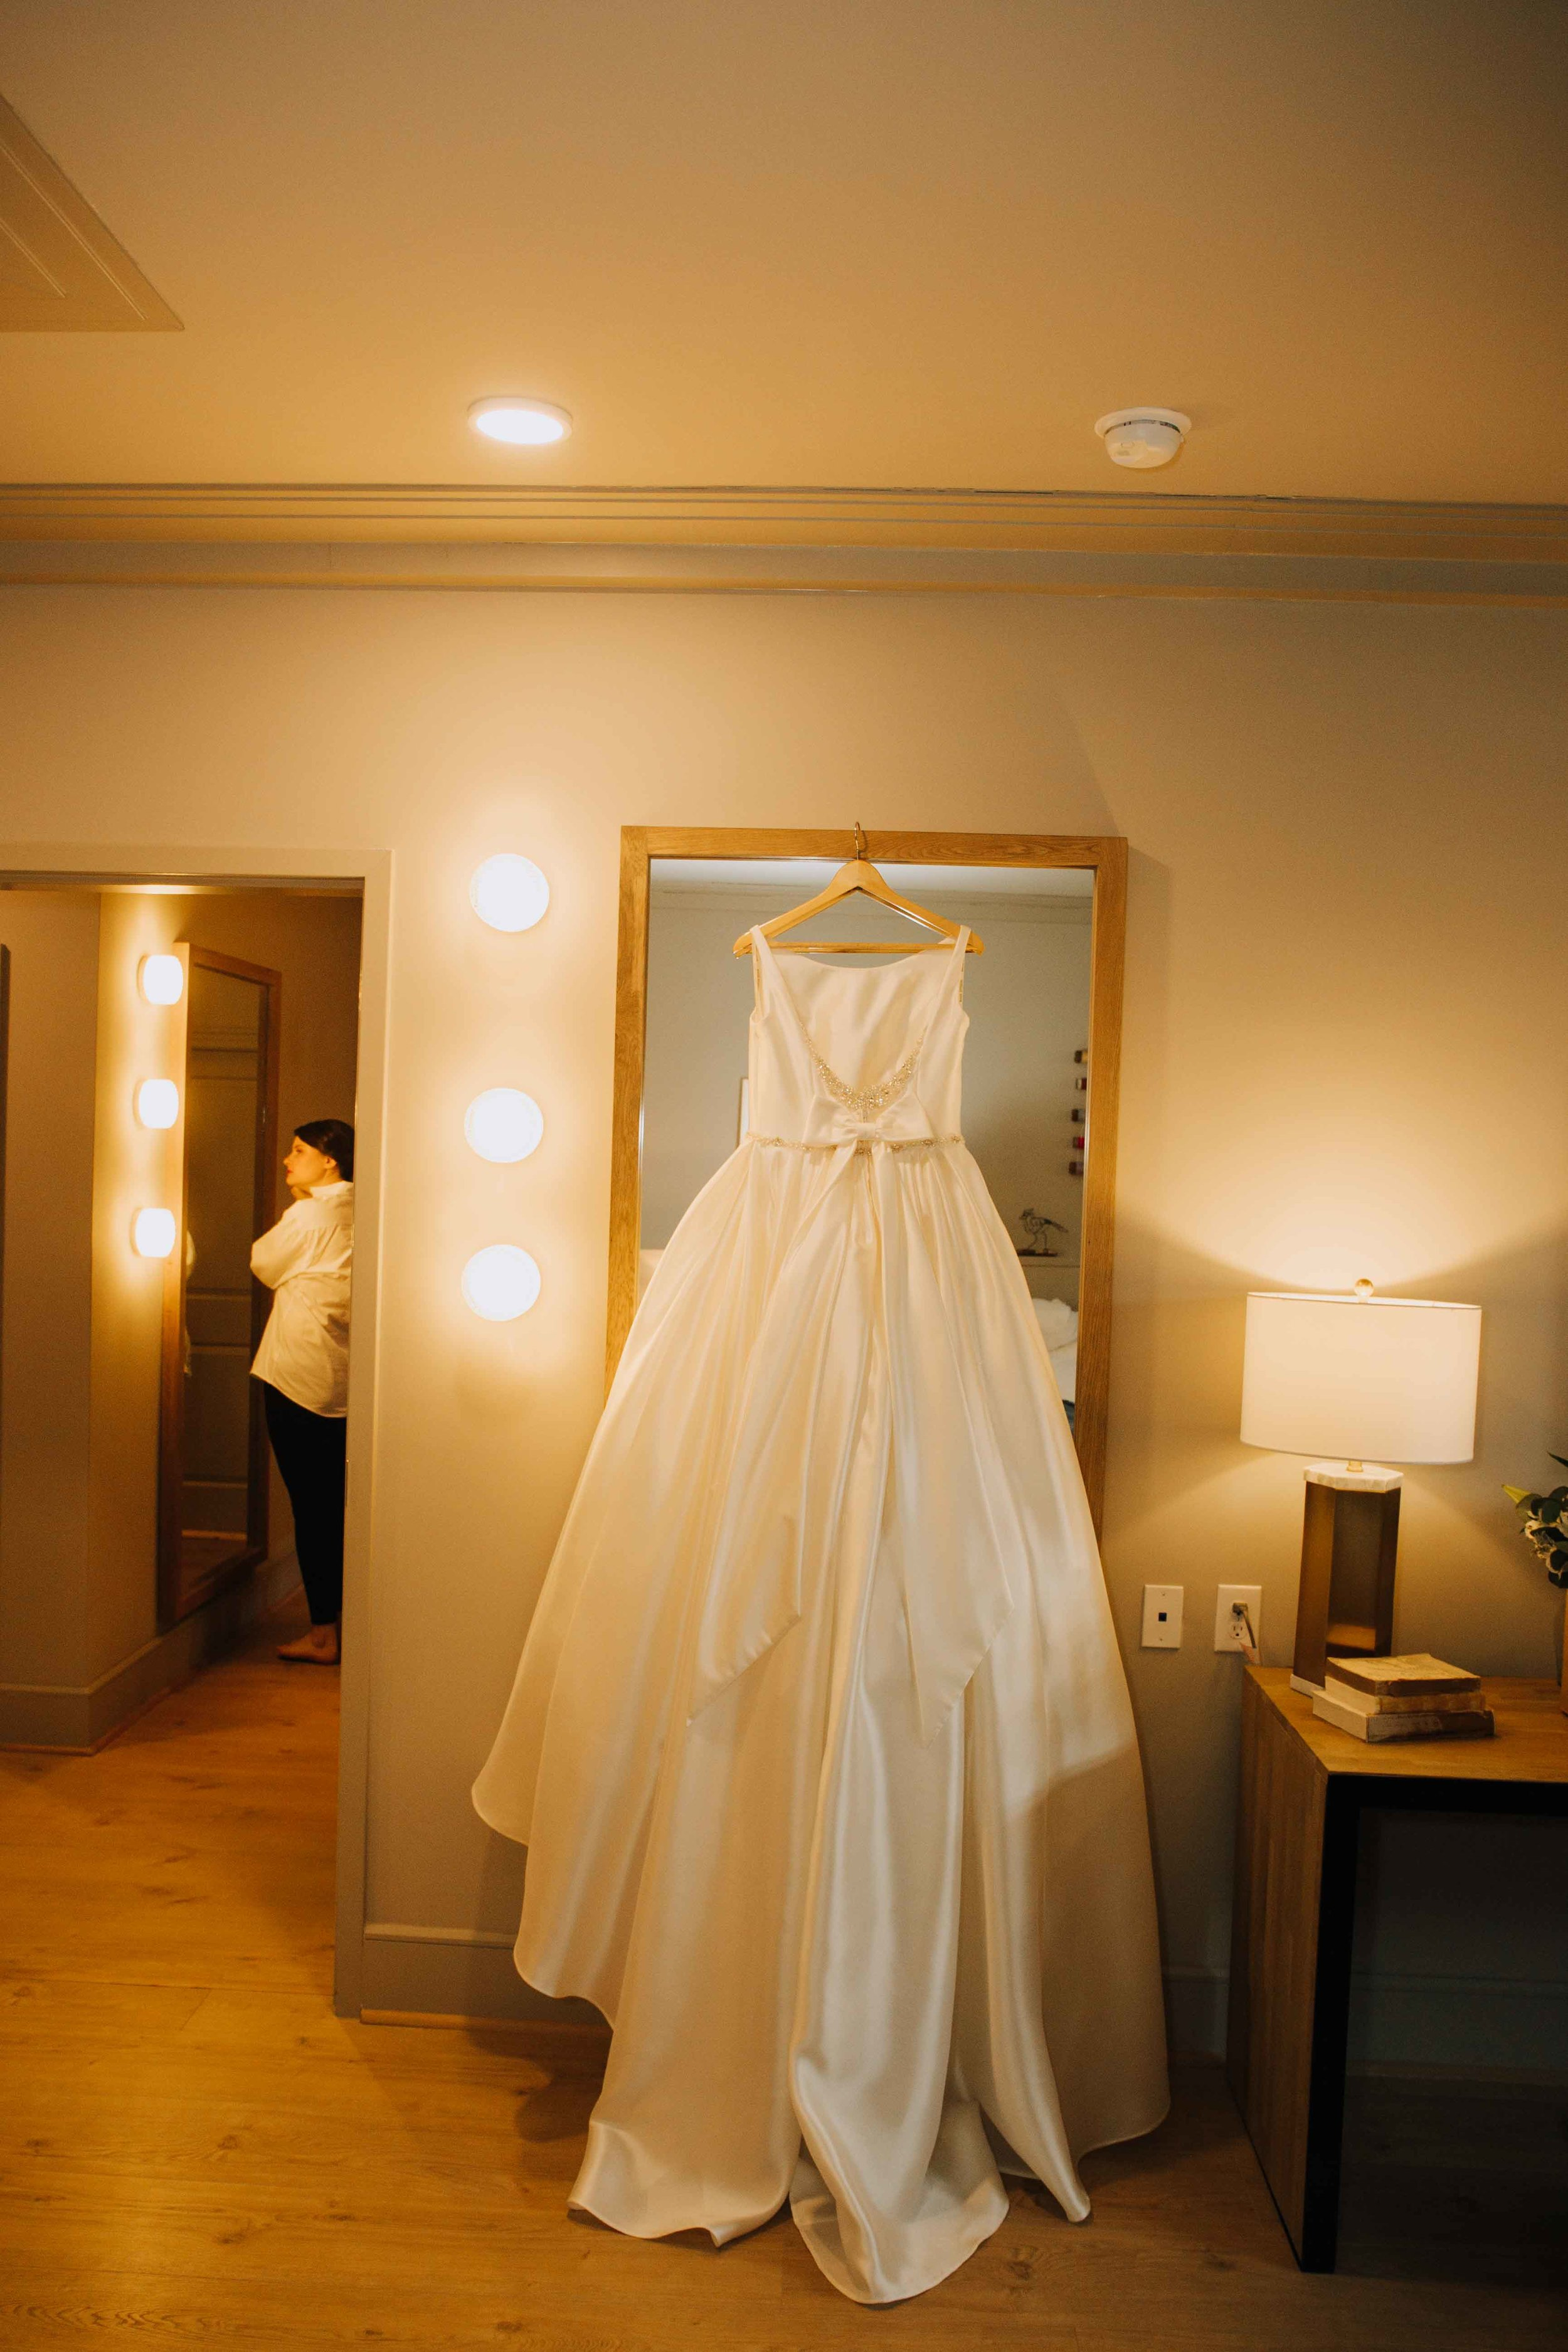 Farmville-Virginia-Wedding-Hotel-Weynoke-Downtown-Jacqueline-Waters-Photography-Detailed- (68).jpg